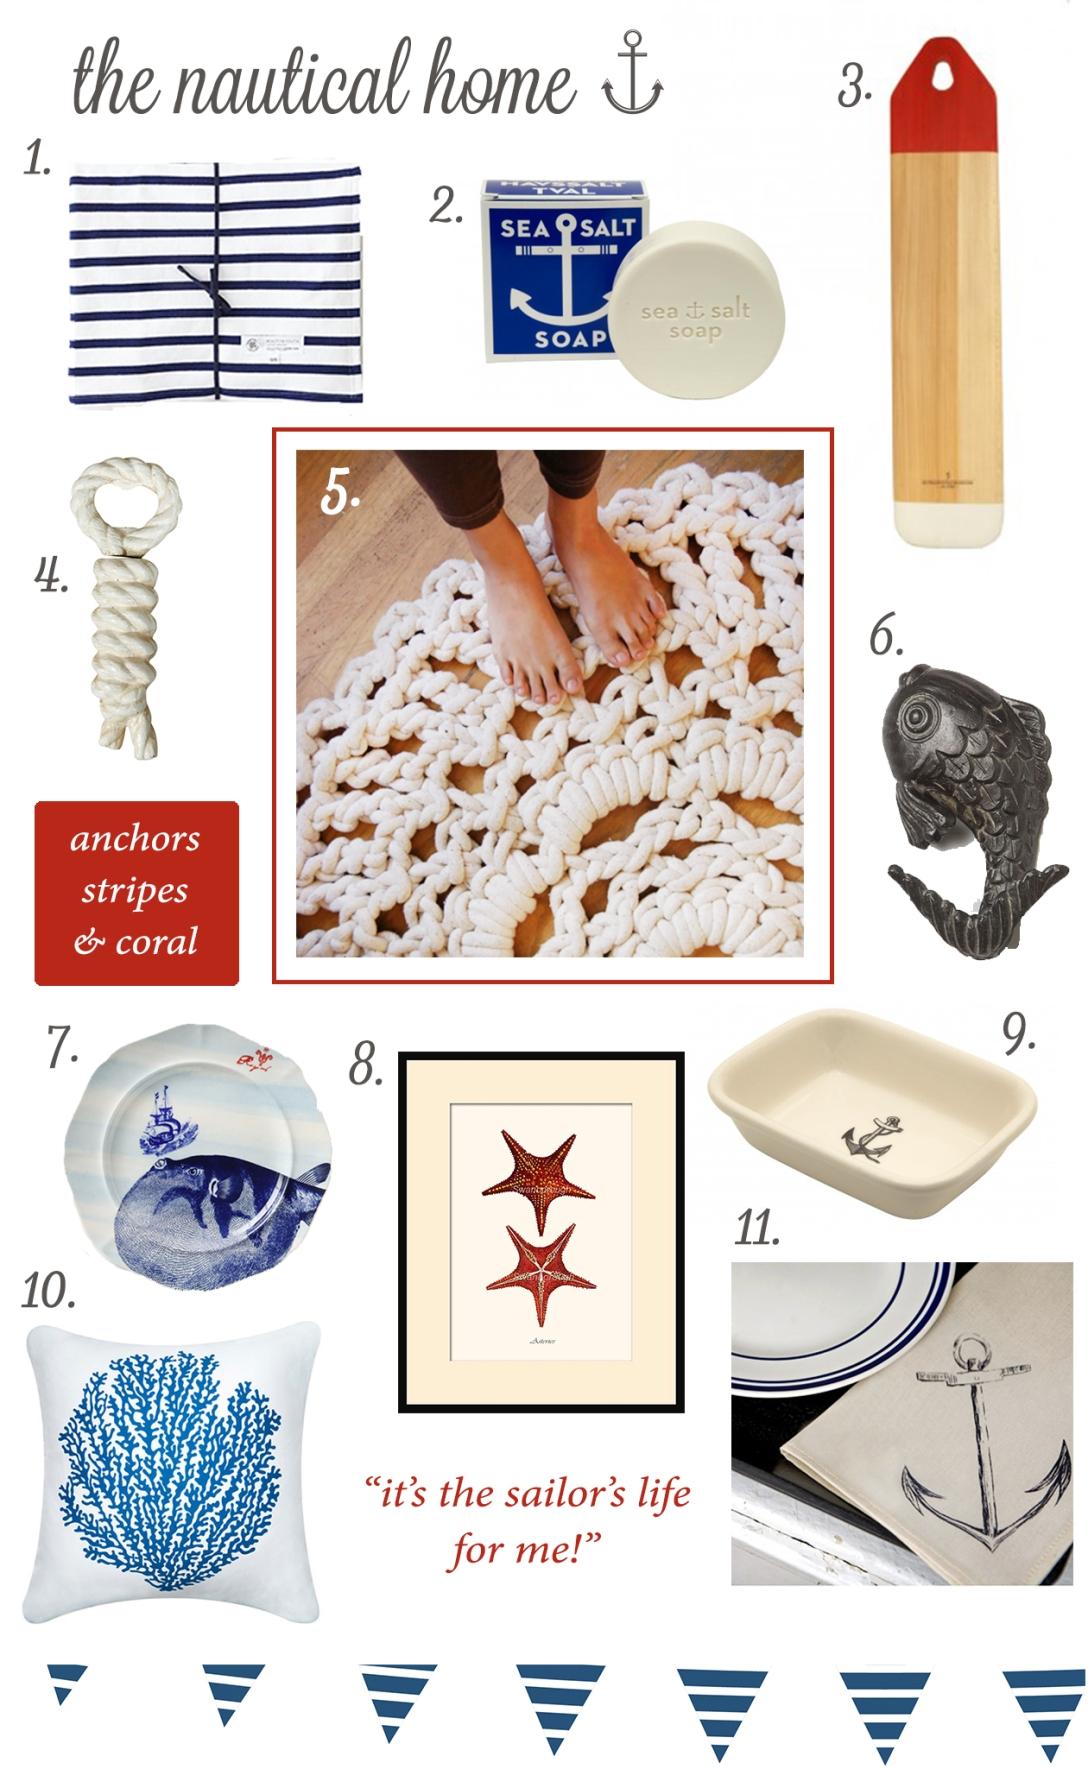 Nautical Home accessories